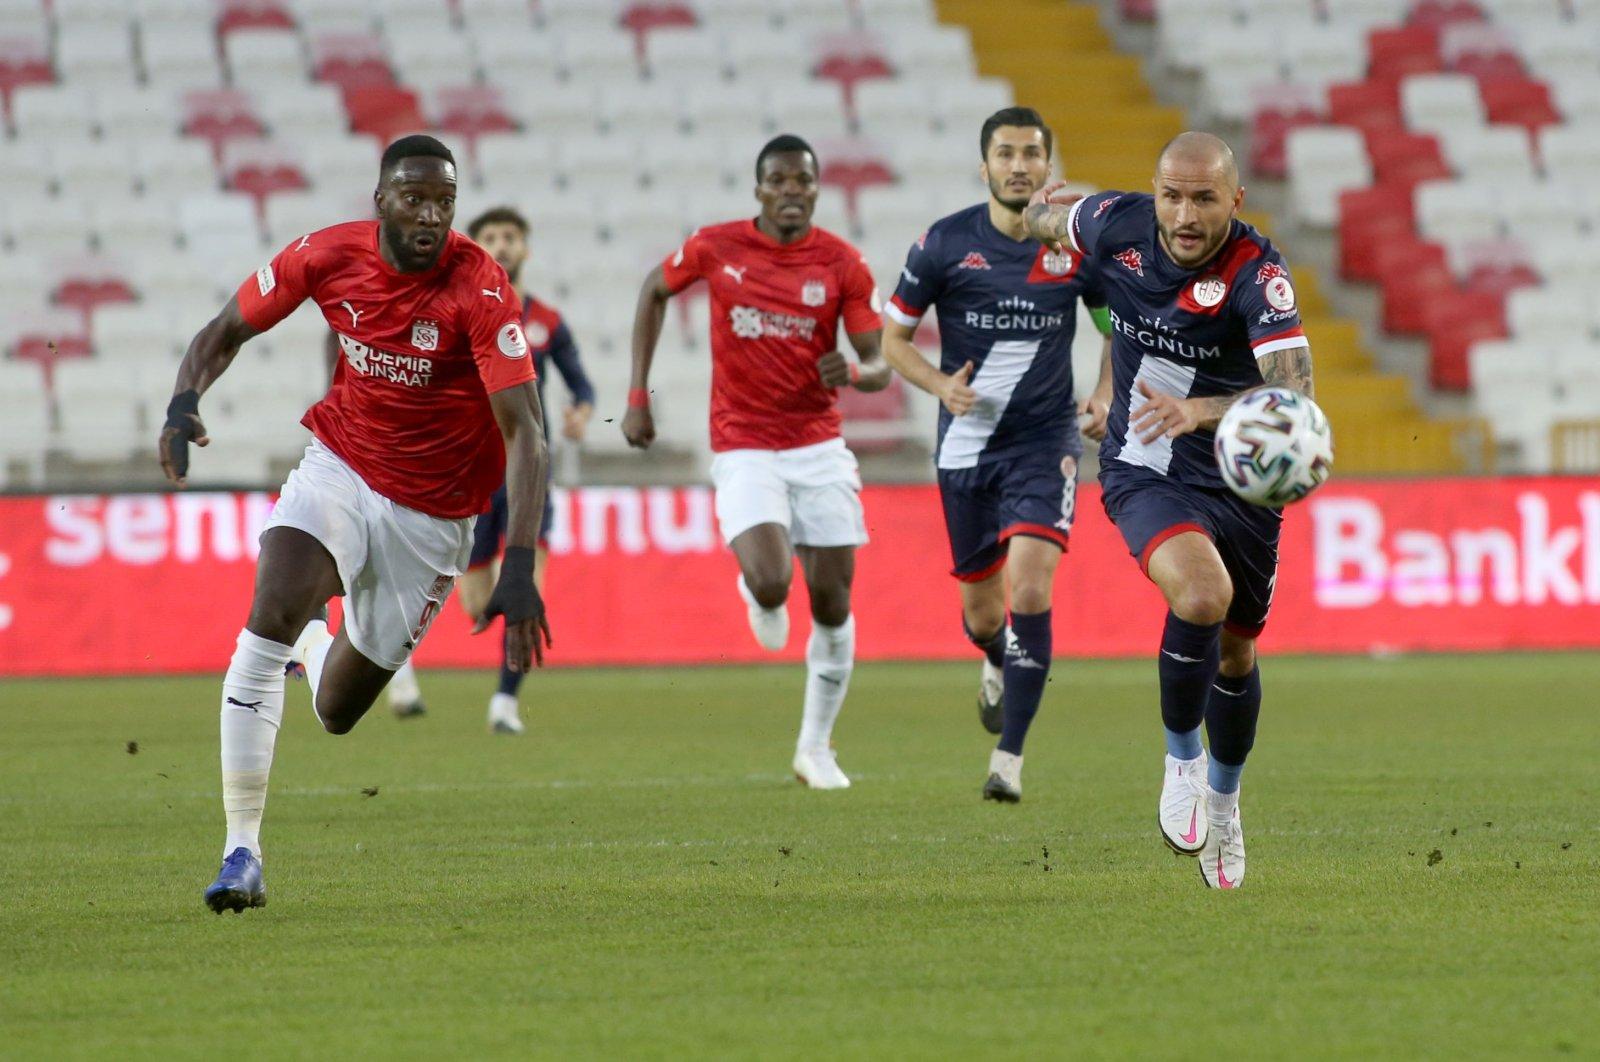 Fraport TAV Antalyaspor and Demir Grup Sivasspor players struggle for possession of the ball during a Ziraat Turkish Cup quarterfinals match at Atatürk Stadium, Sivas province, central Turkey, Feb. 11, 2021 (AA Photo)